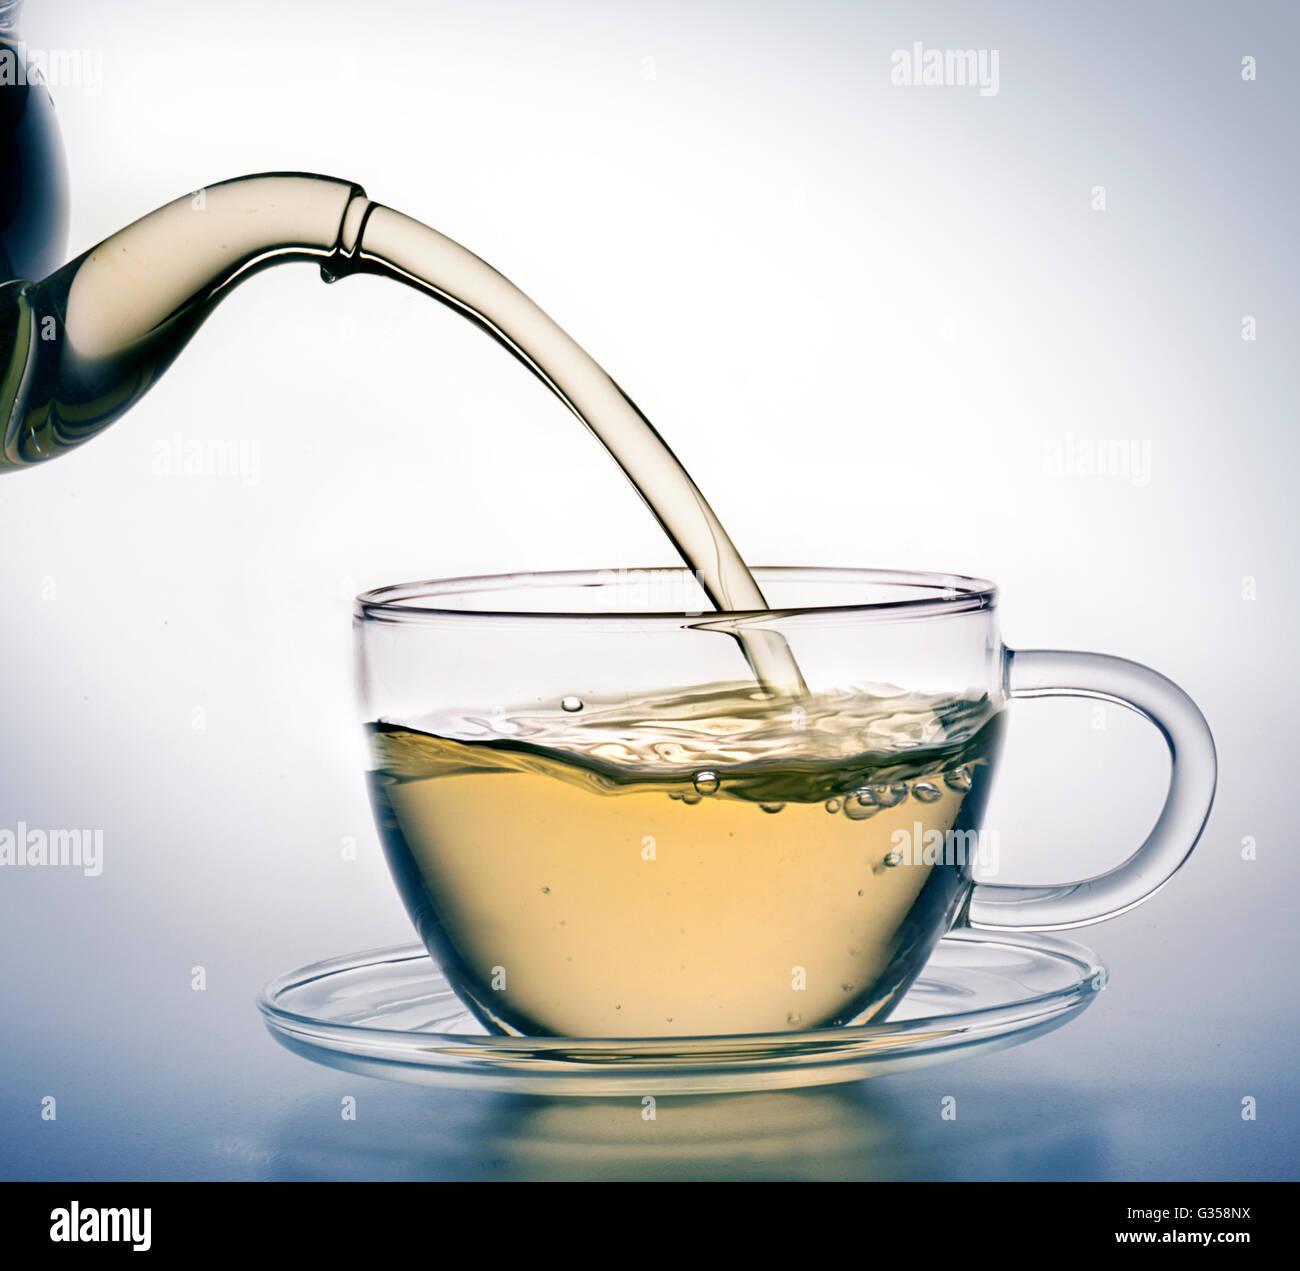 Grüner Tee gießen Stockbild